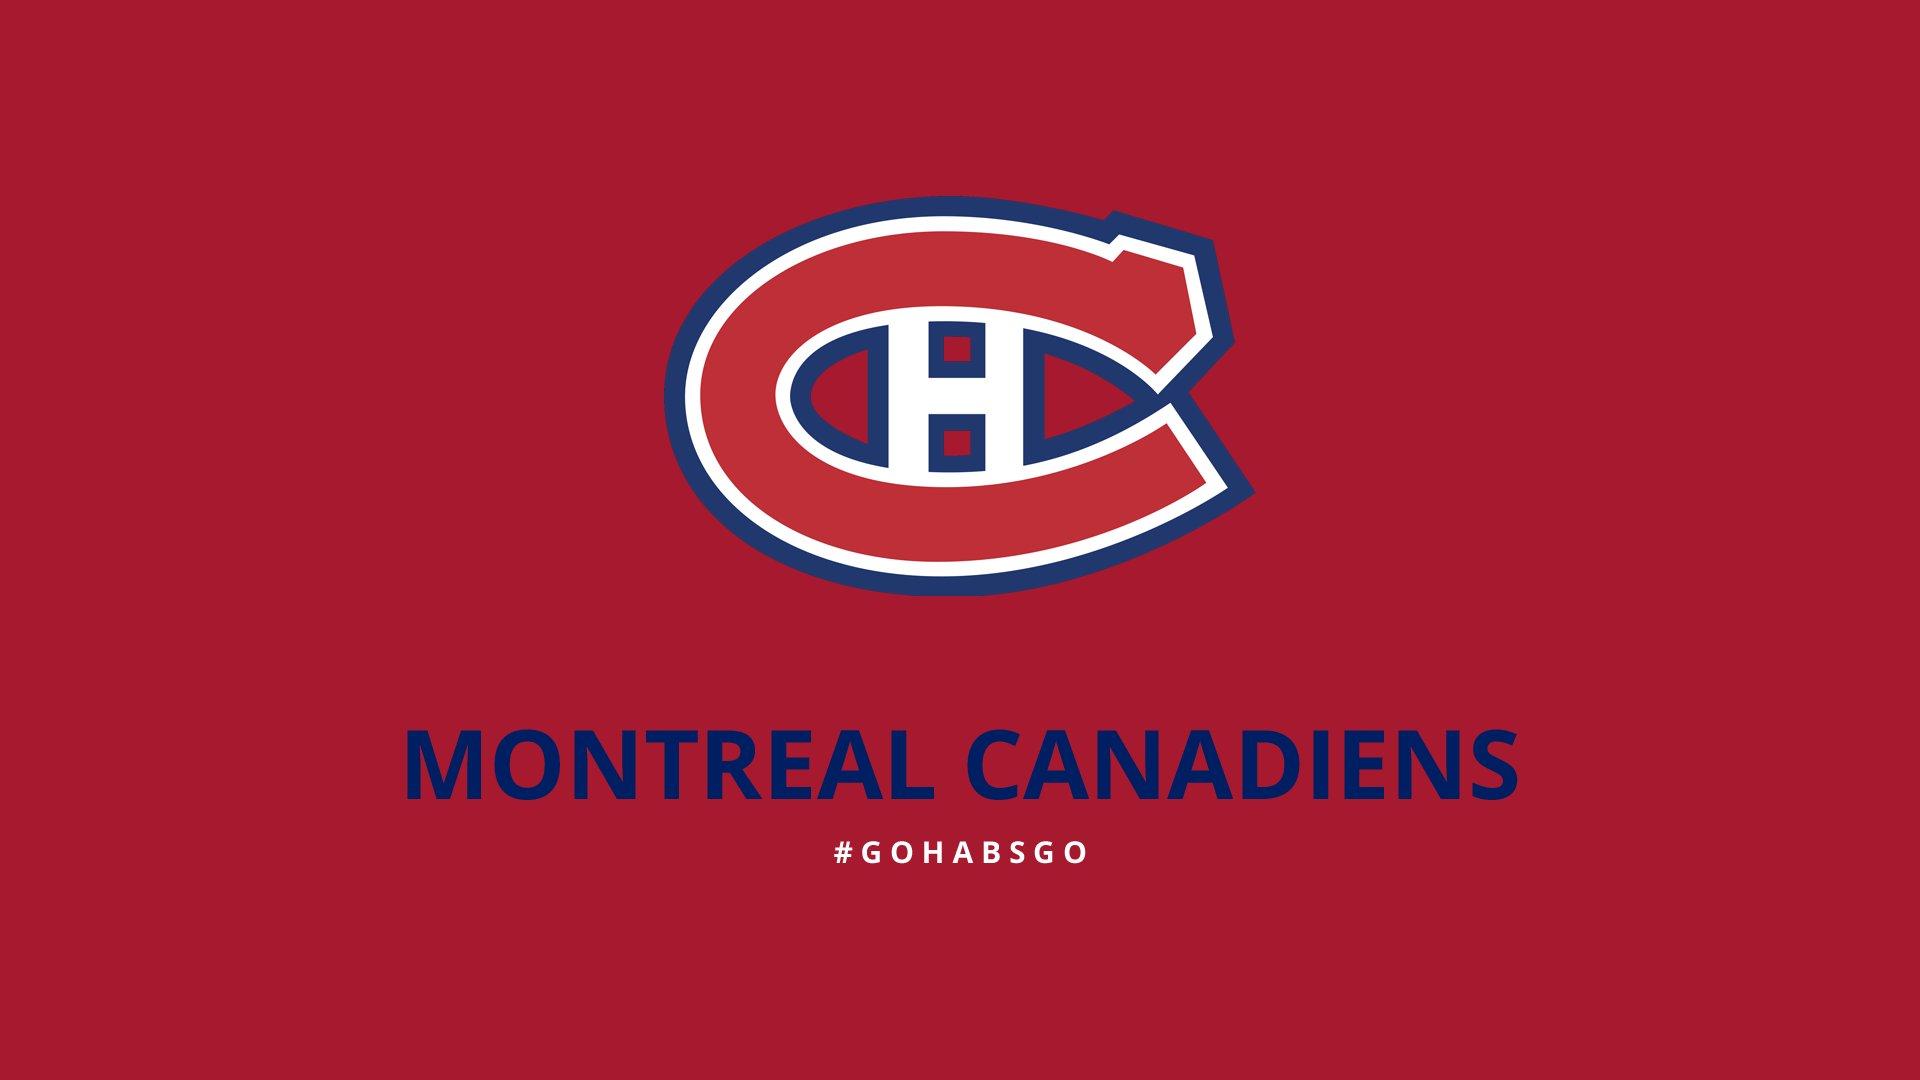 MONTREAL CANADIENS nhl hockey 4 wallpaper 1920x1080 1920x1080